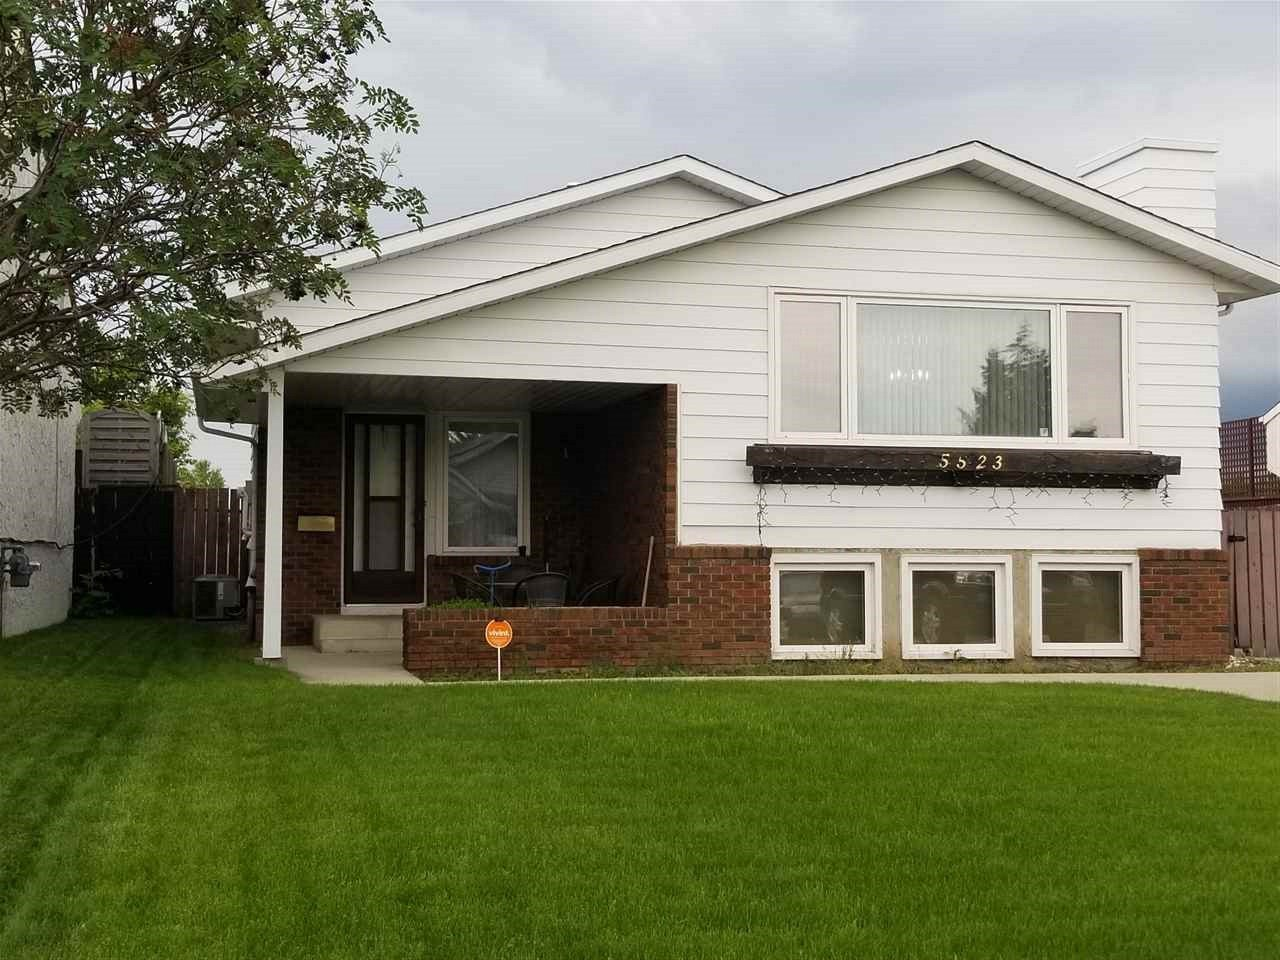 Main Photo: 5523 10 Avenue in Edmonton: Zone 29 House for sale : MLS®# E4164946